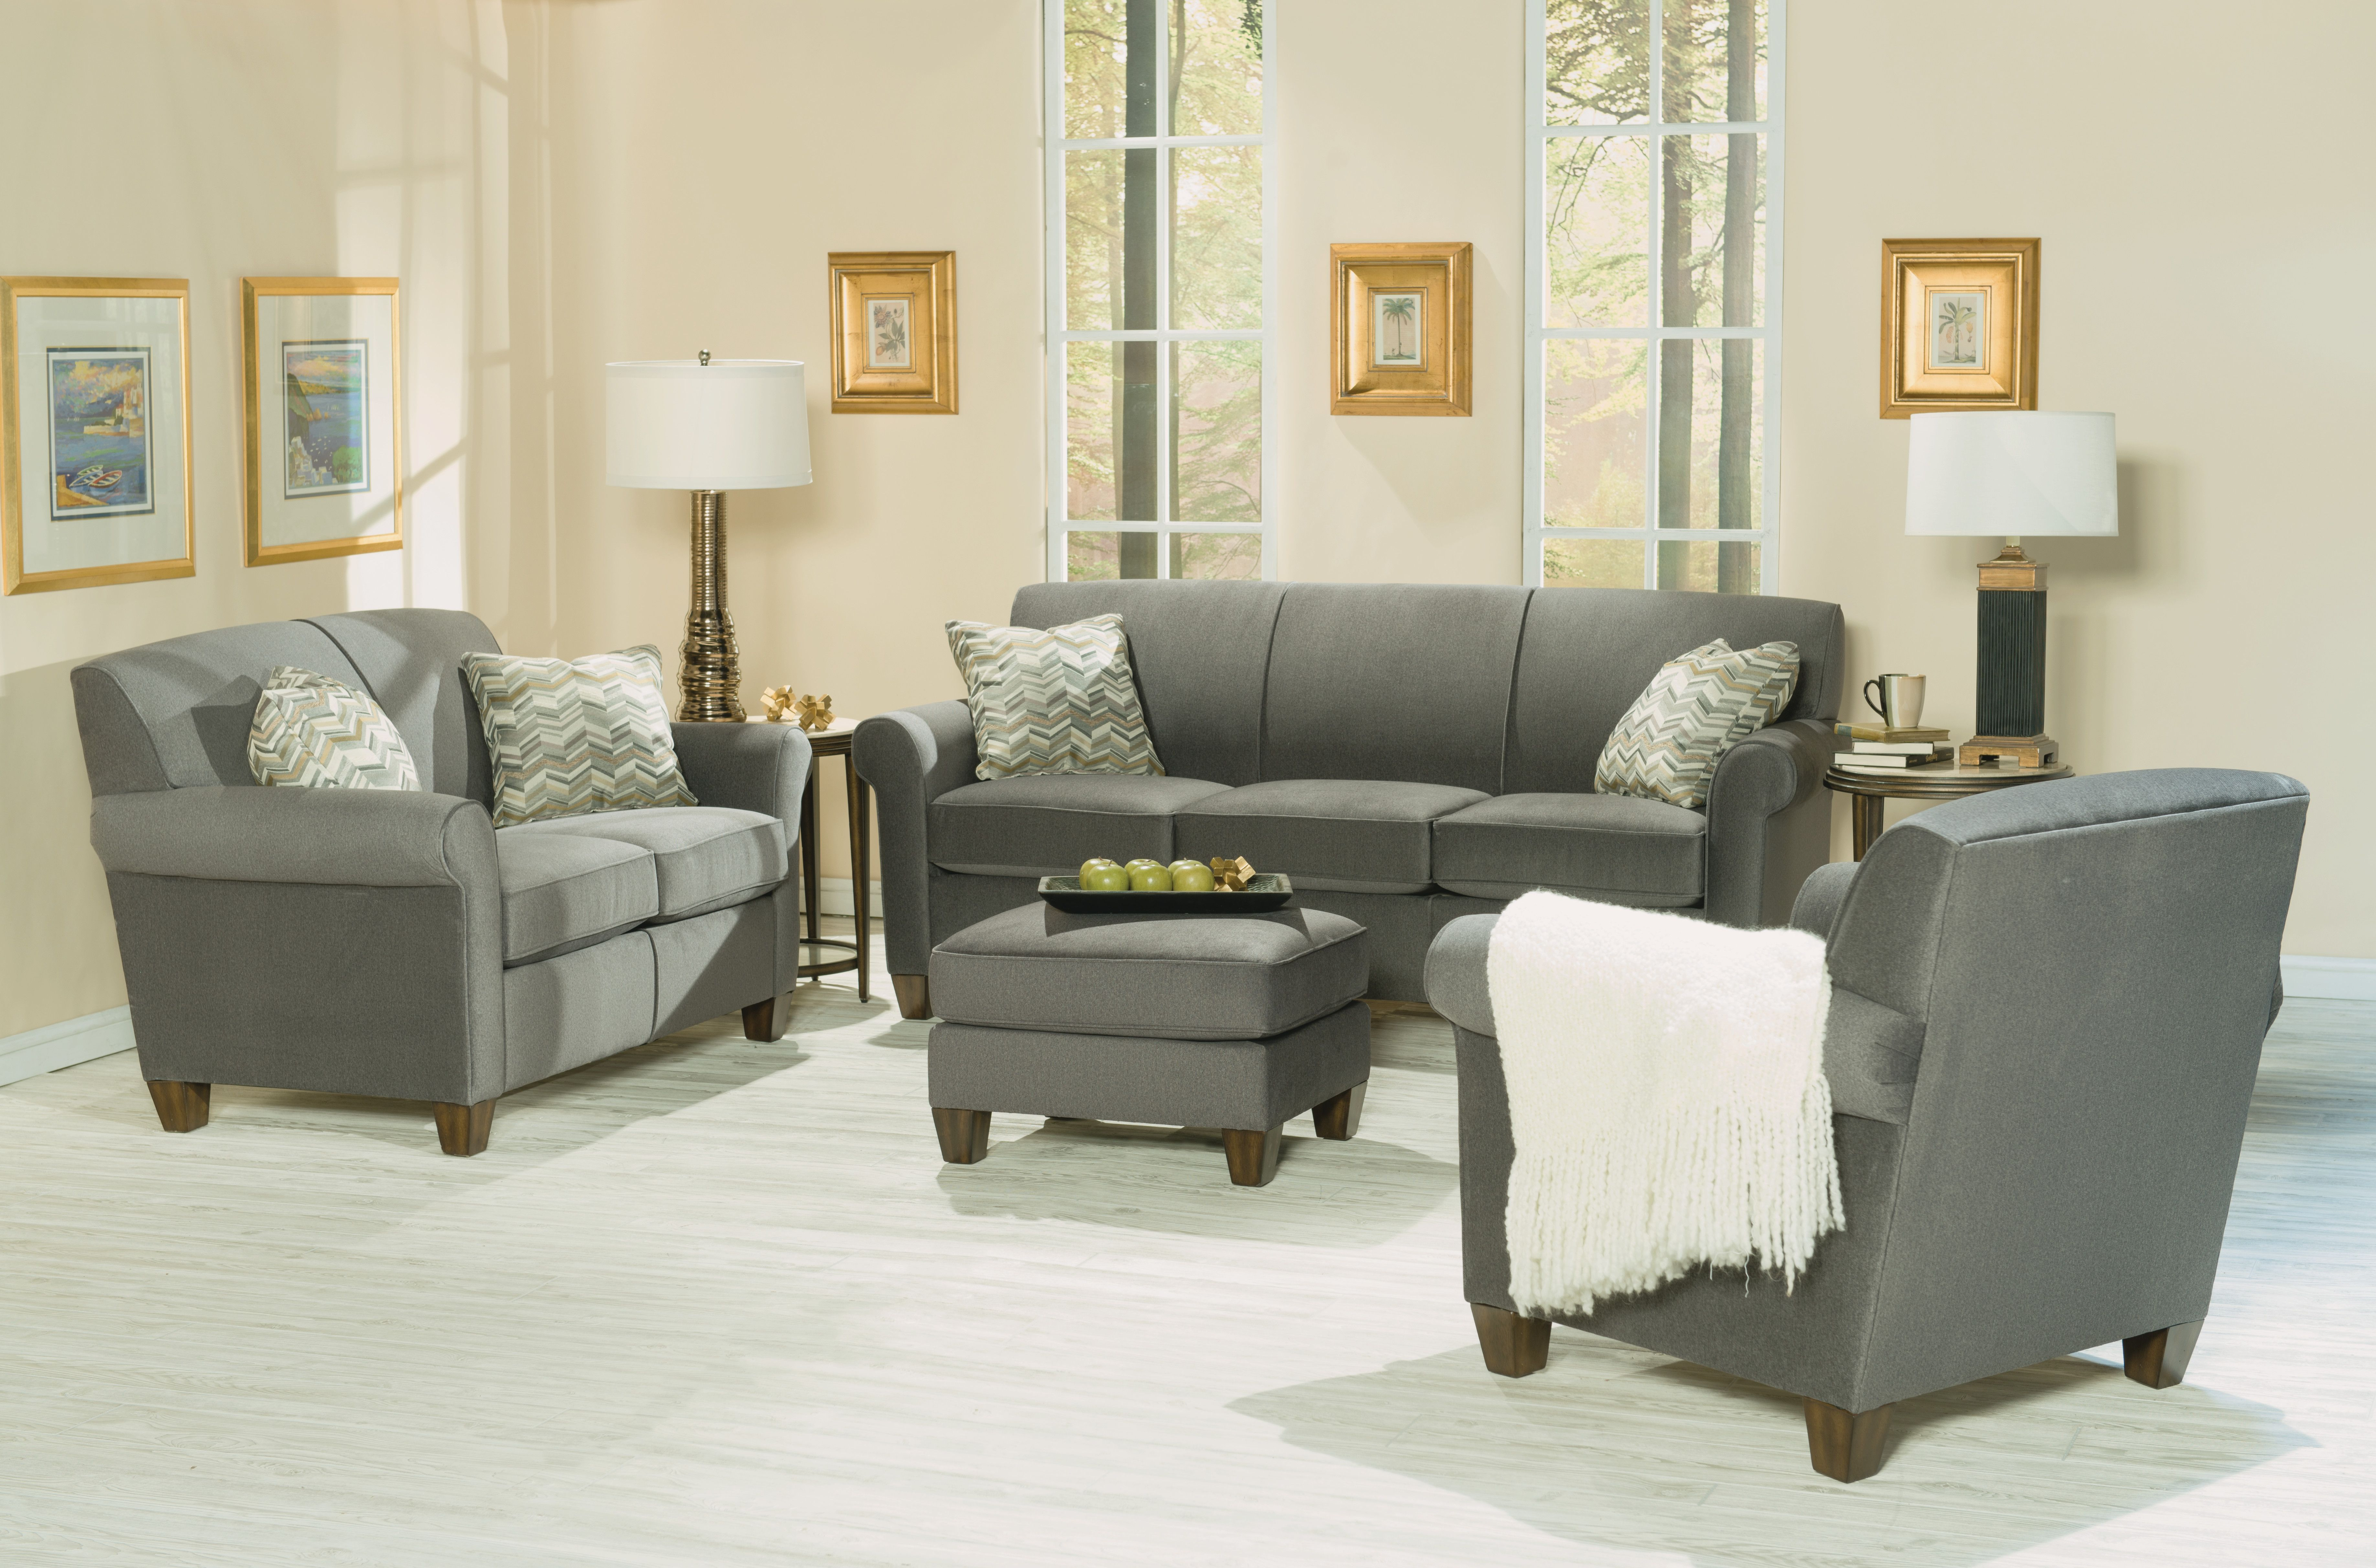 Latitudes Chaucer Power High Leg Recliner By Flexsteel Flexsteel Furniture High Leg Recliner Furniture